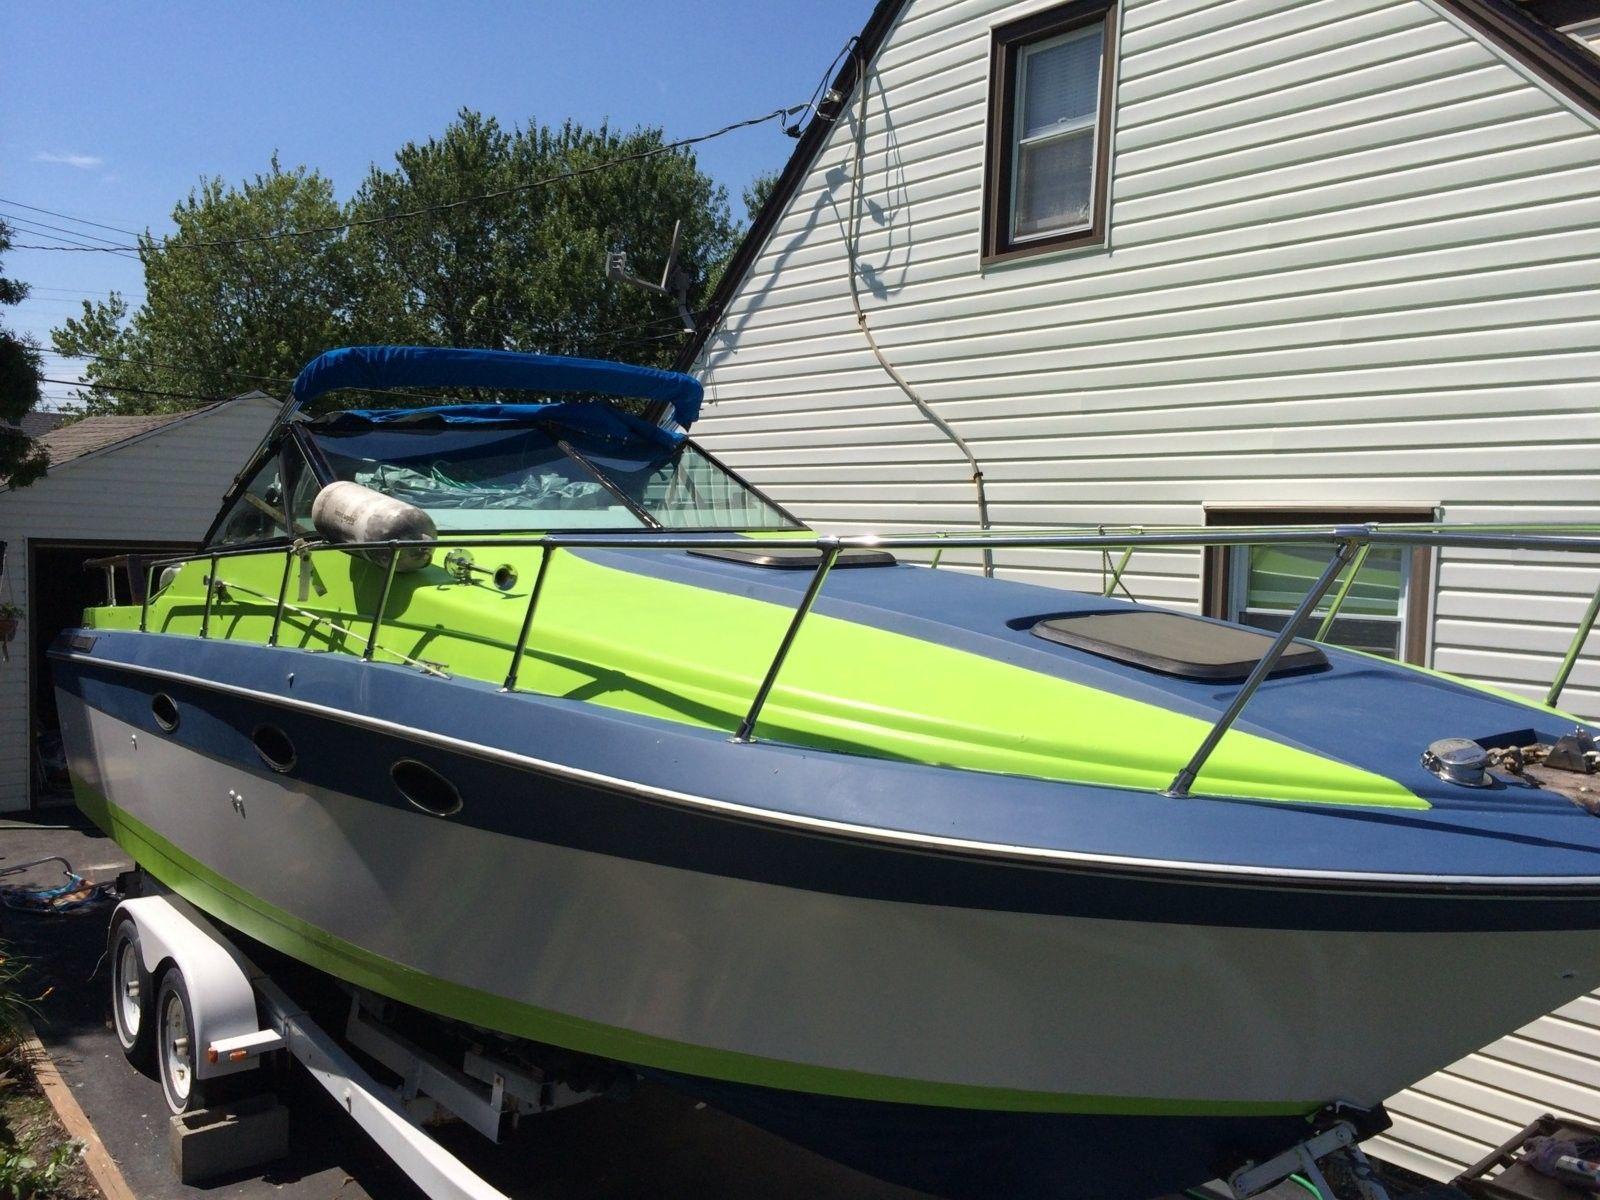 Name my boat - FREE Vinyl decal if chosen!! - IMG_4925.JPG